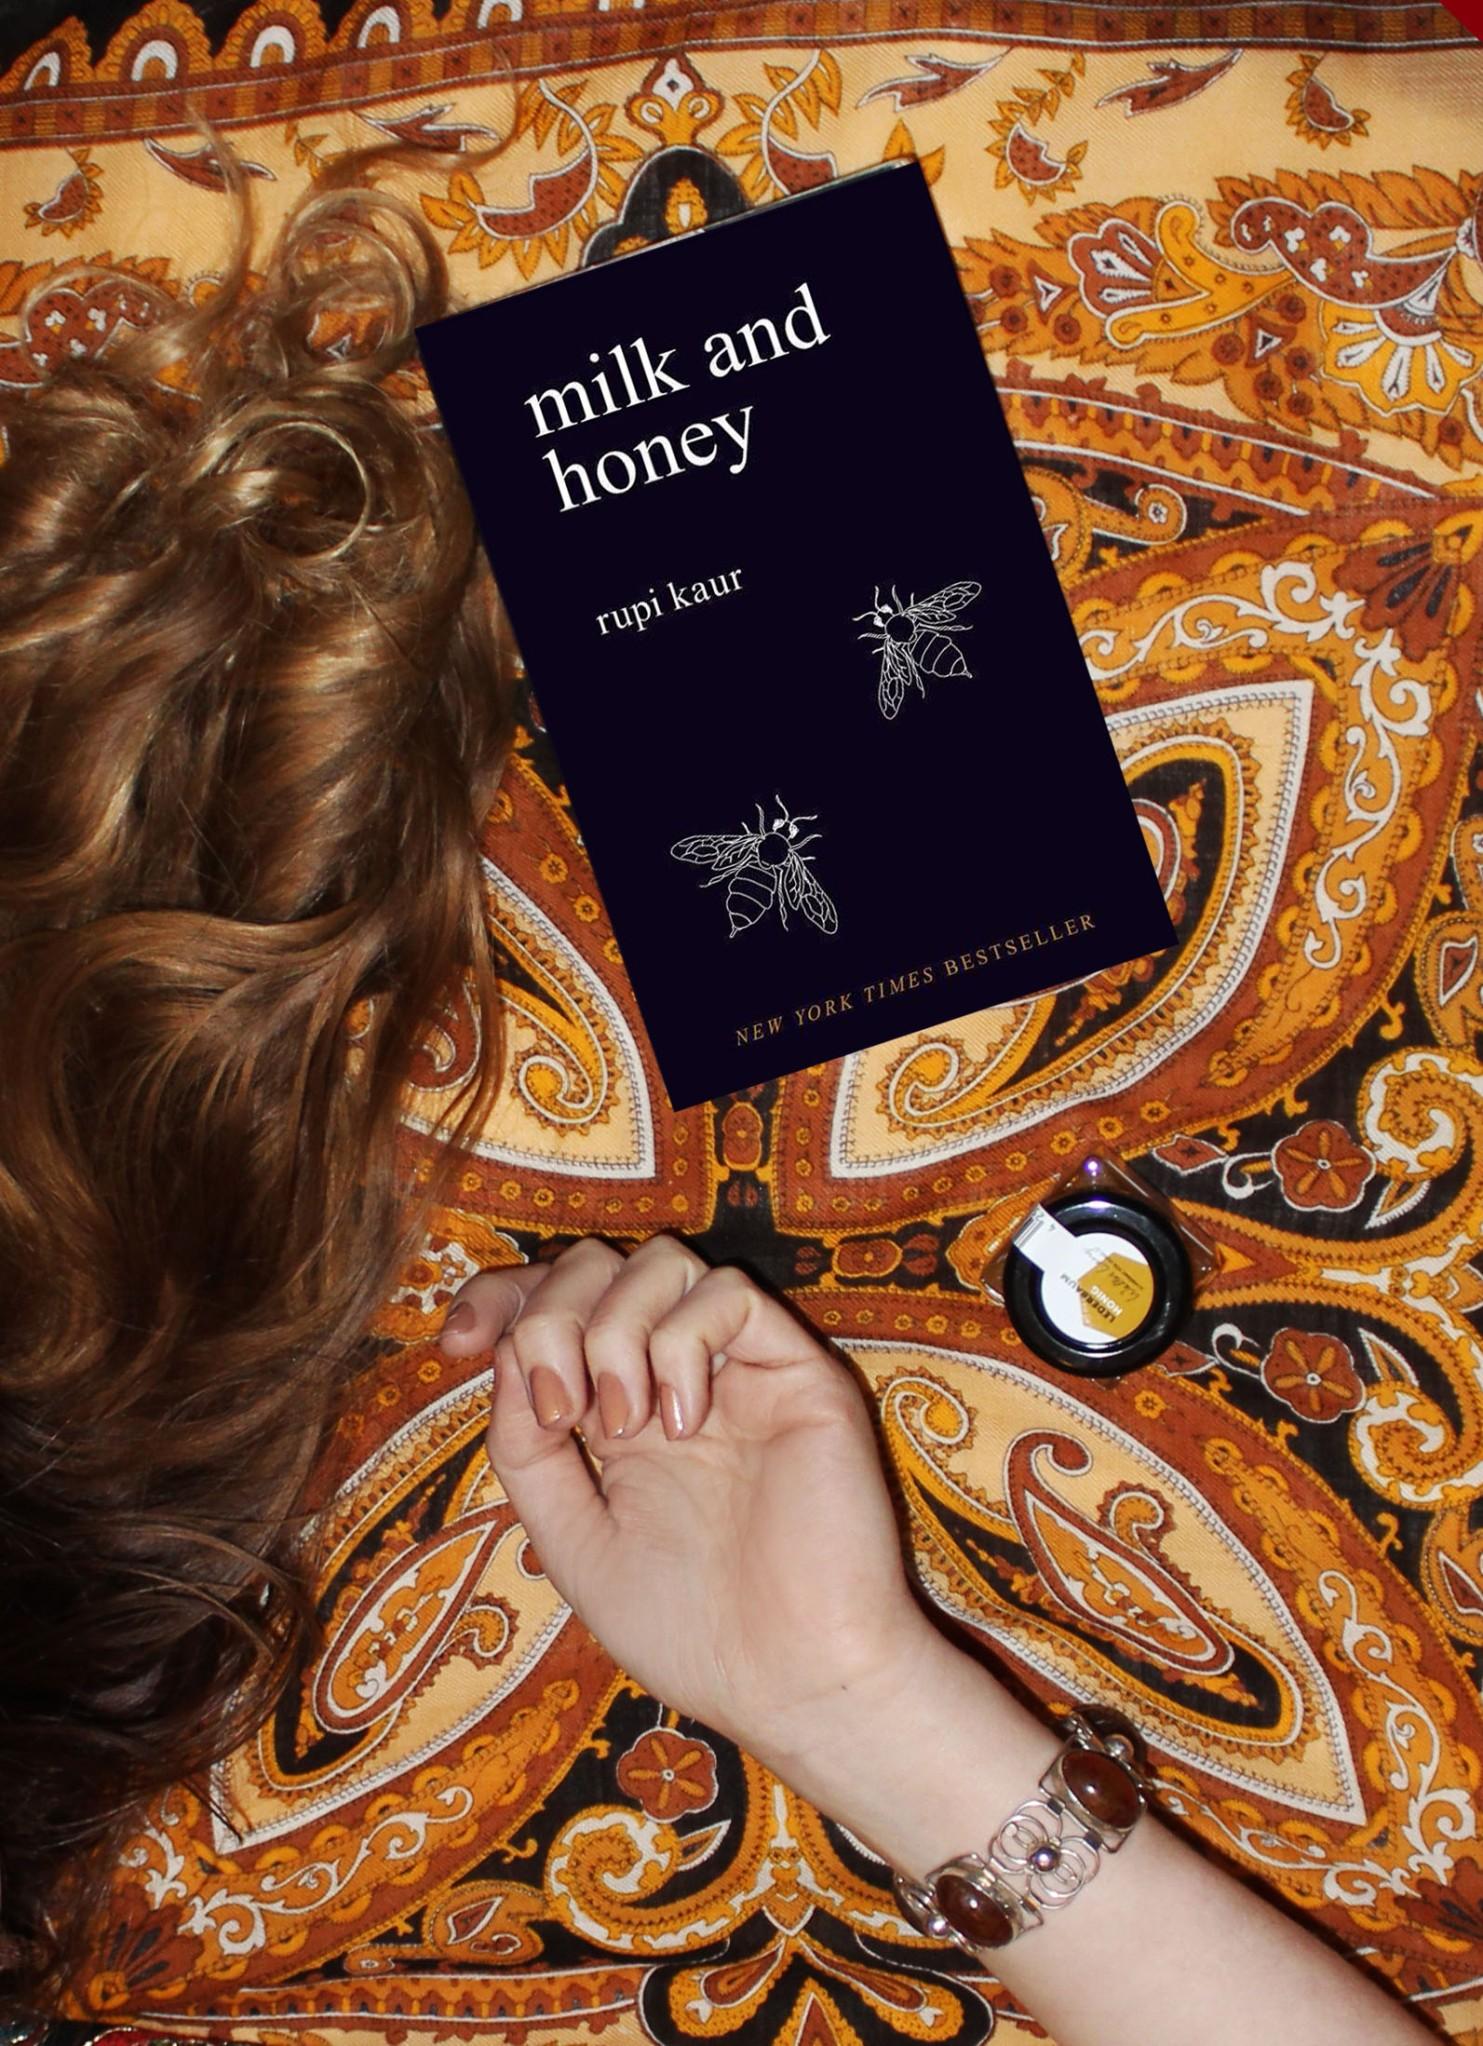 honig_milk_and_honey_book